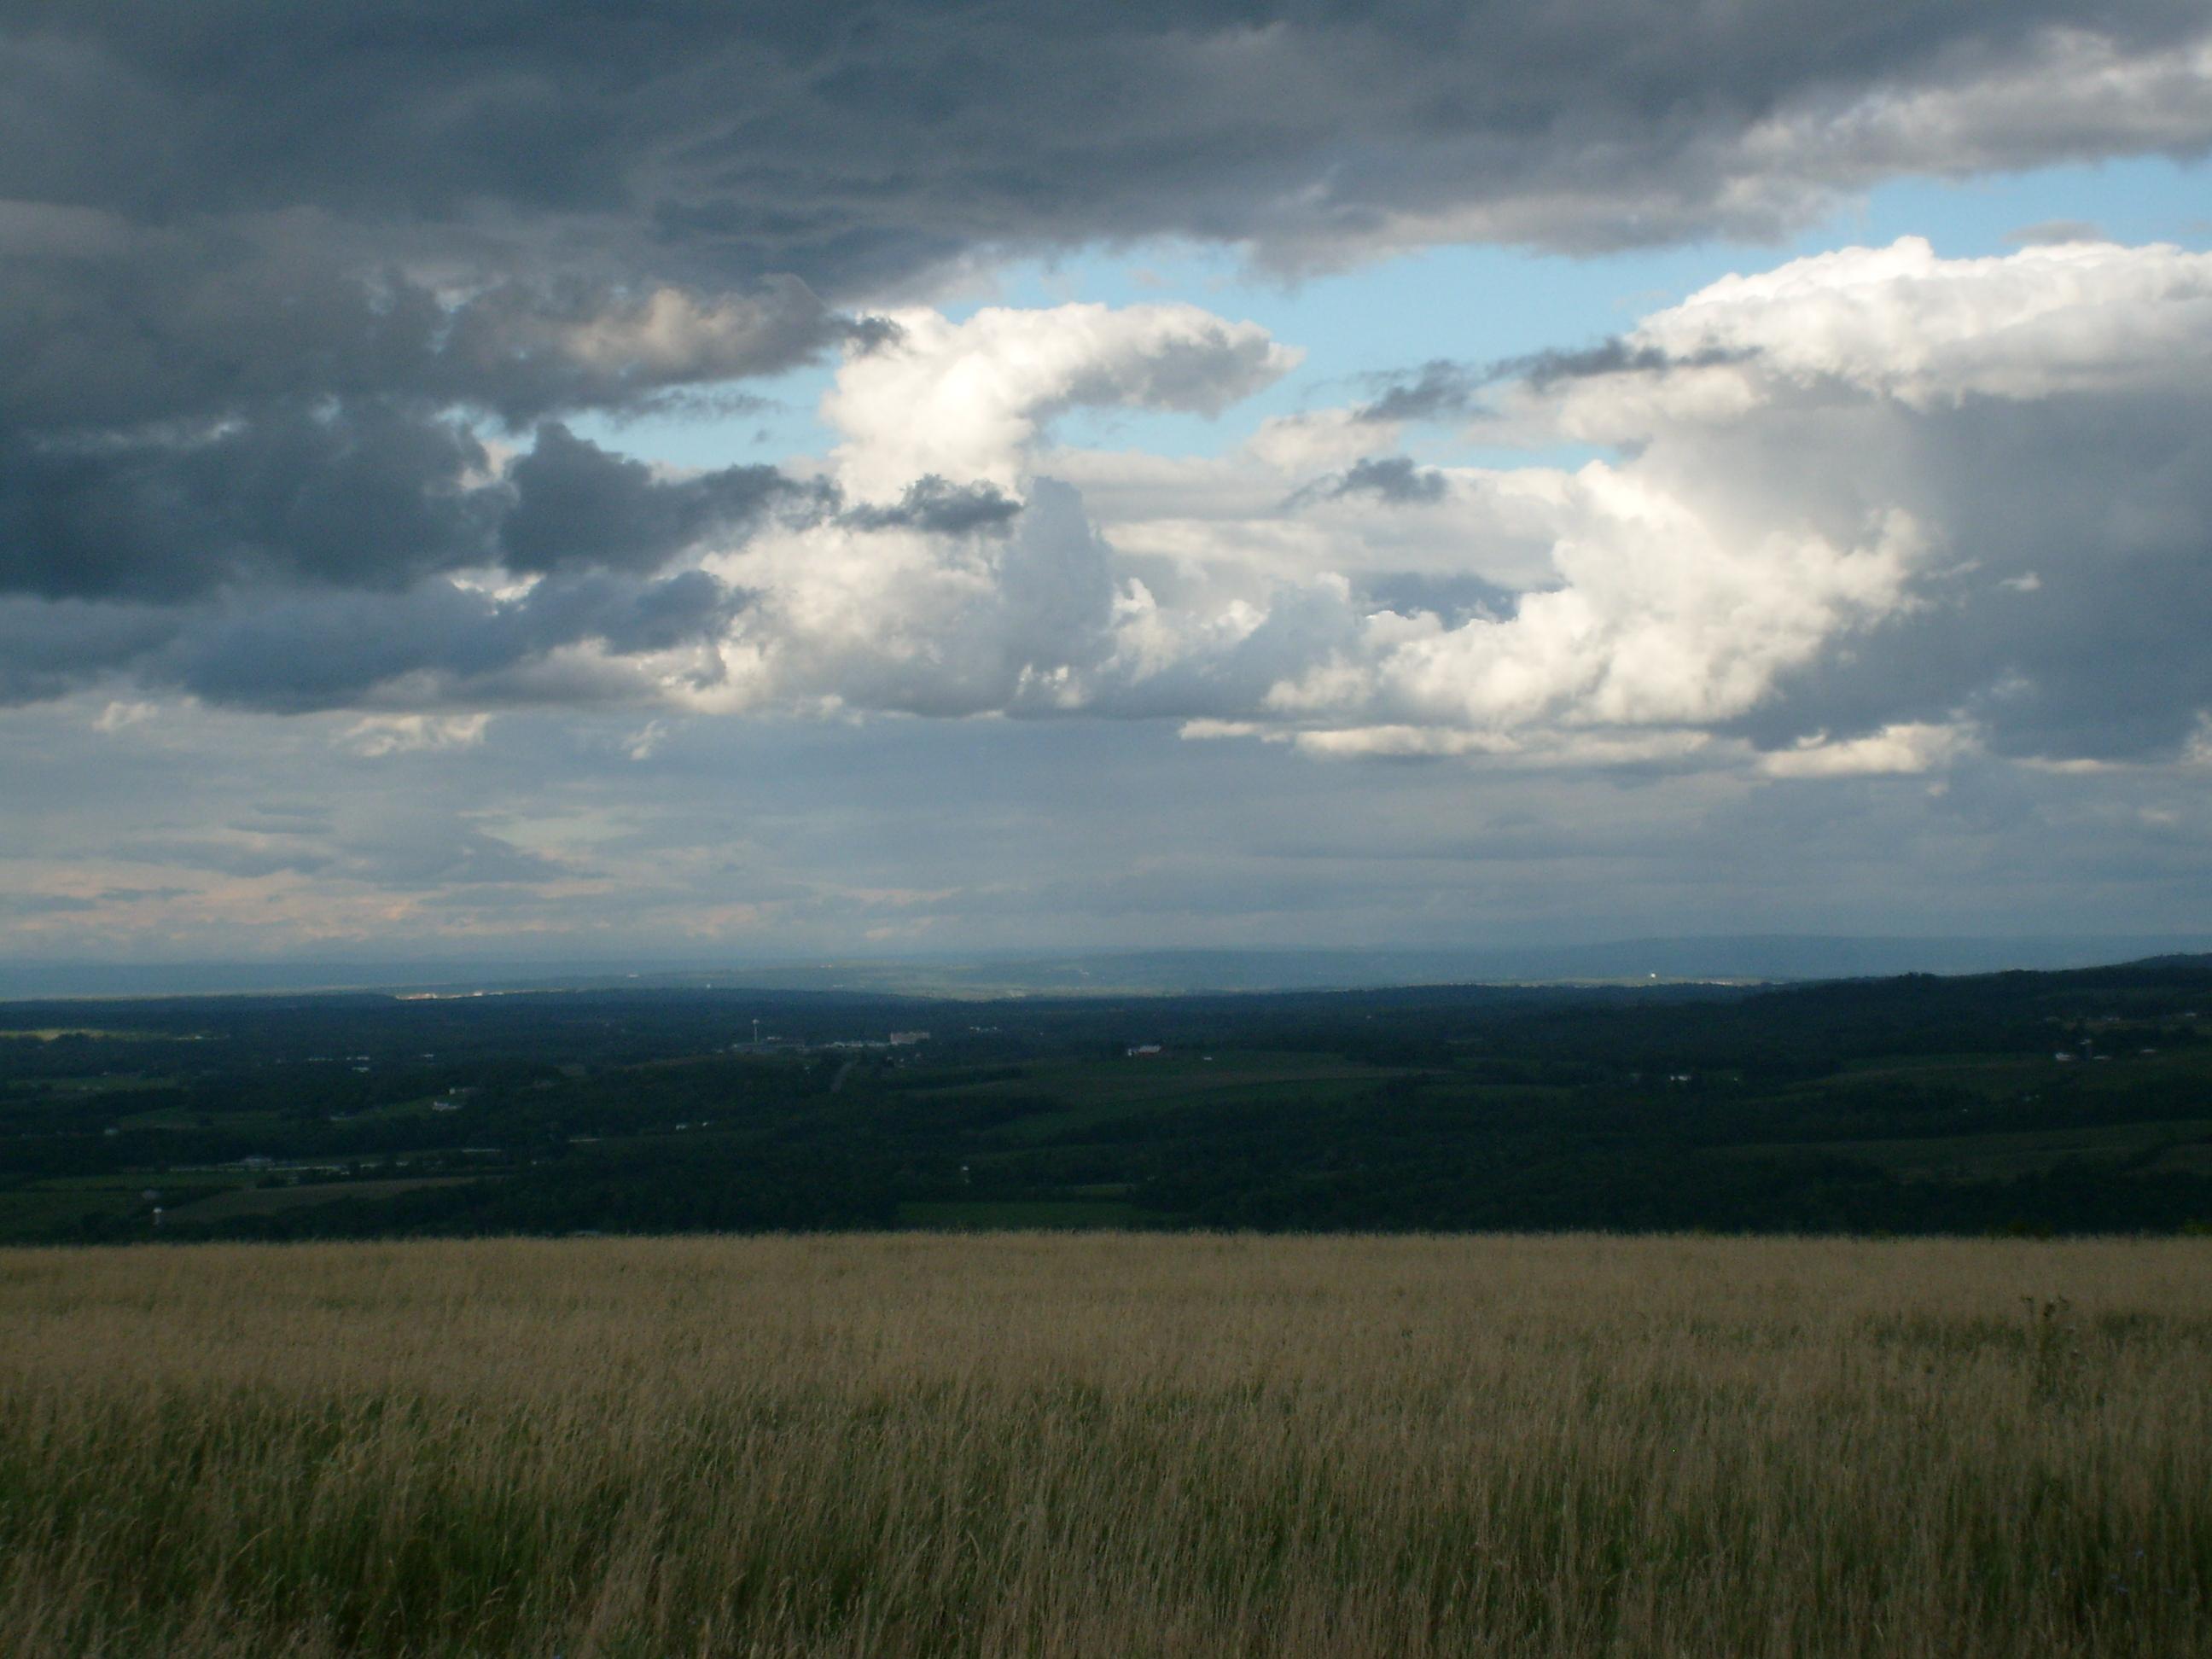 New york oneida county oriskany falls - Sun Storm Clouds Brewing Dark View Wind Front Cornstalks White Hook Cloud Nyc Newyorknewyork Newyorkny